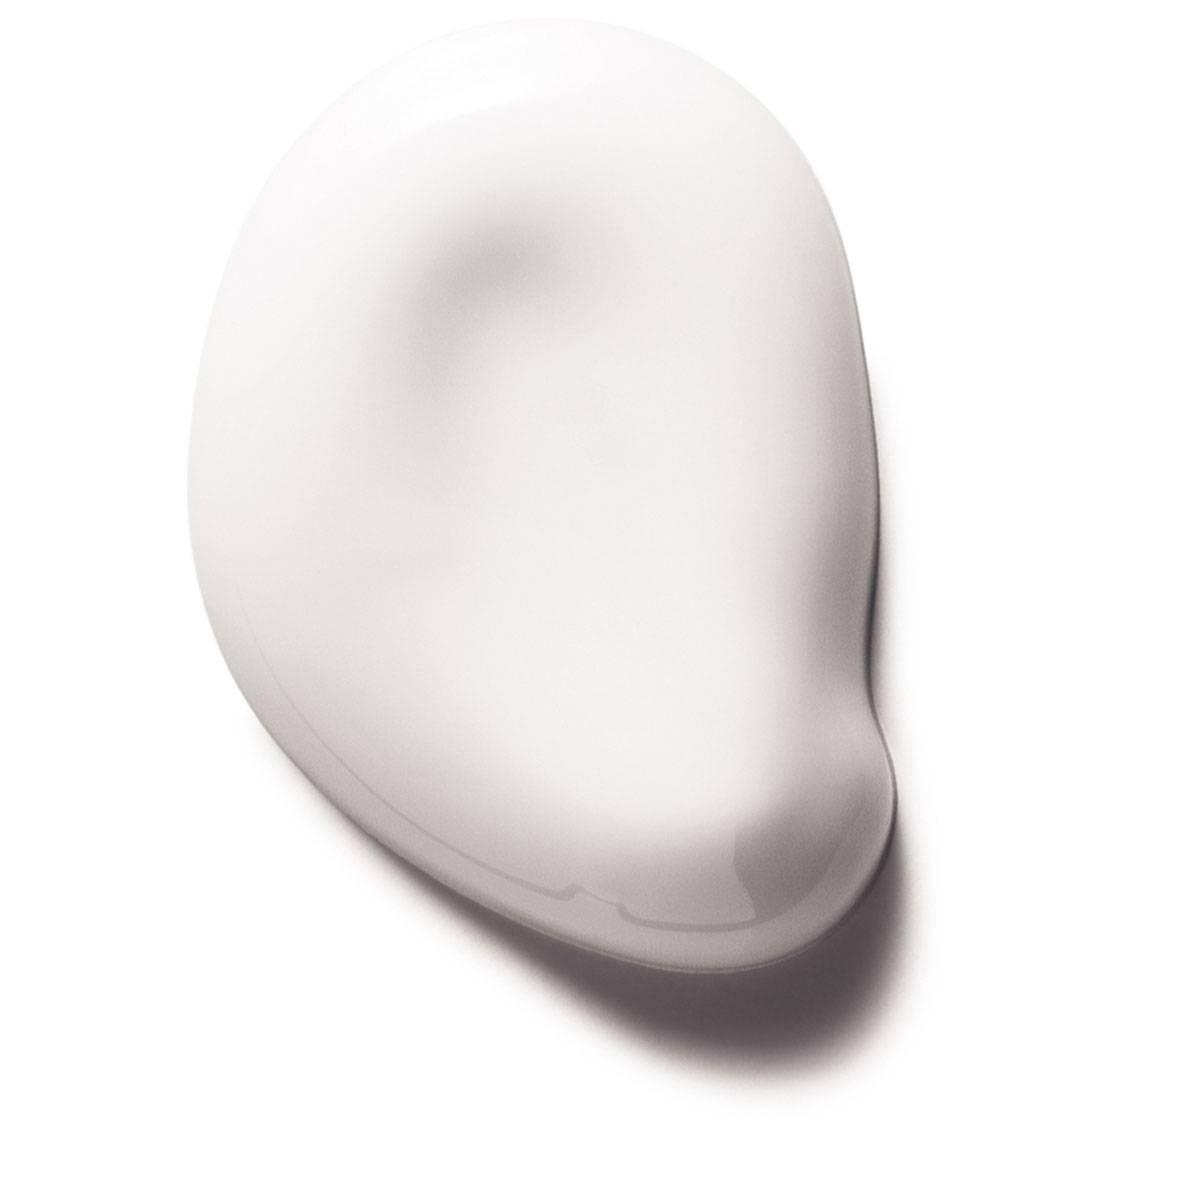 La Roche Posay ProduktSide Hydraphase Rich Texture